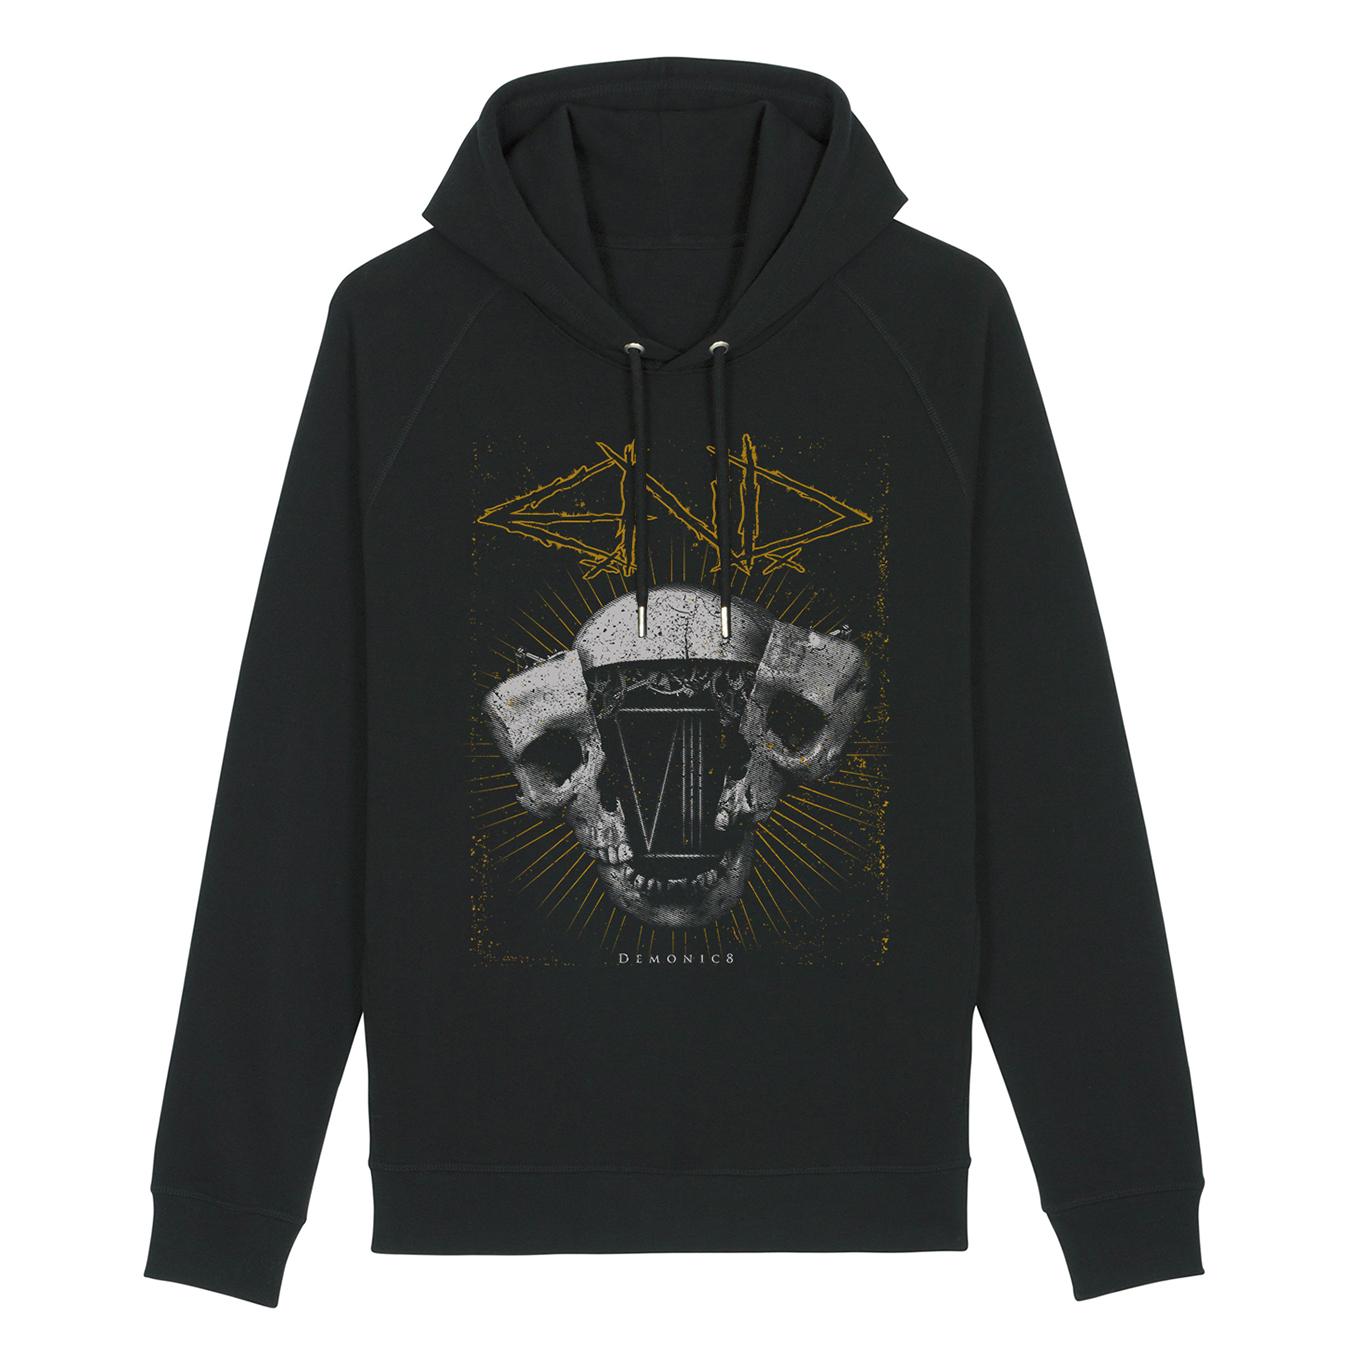 E.N.D. - Demonic8 - Hoodie